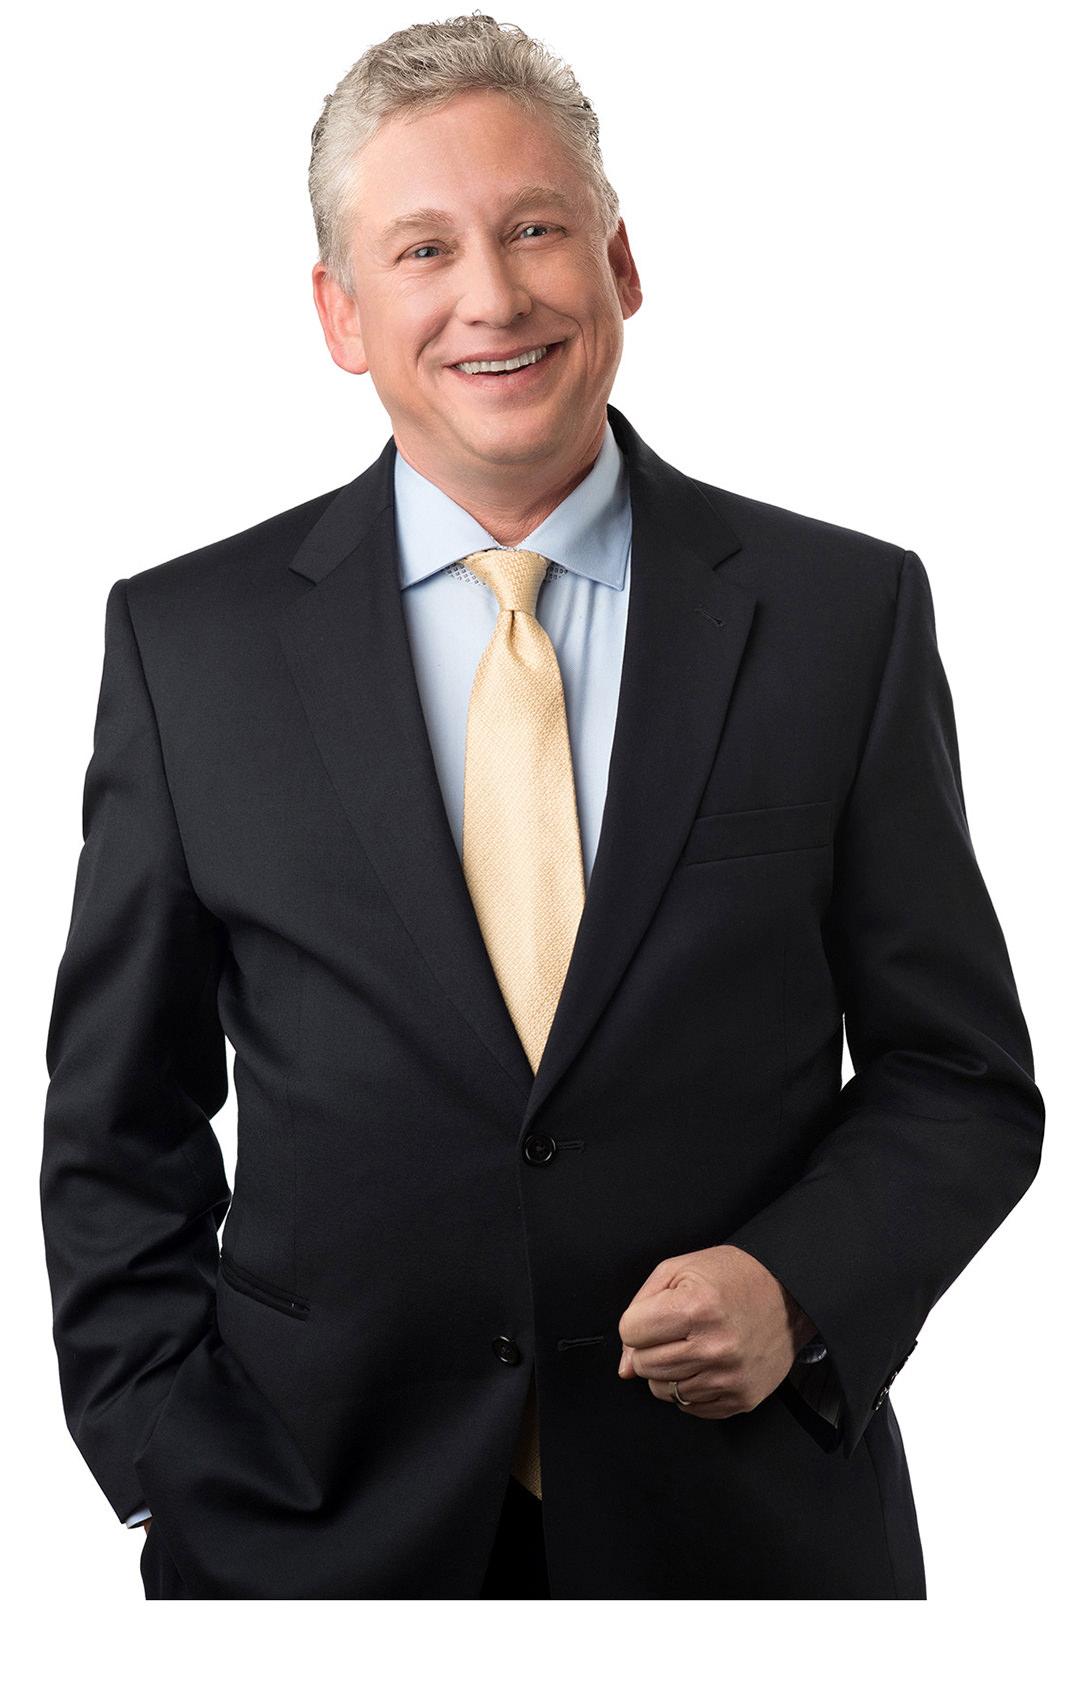 Robert O. Meriwether